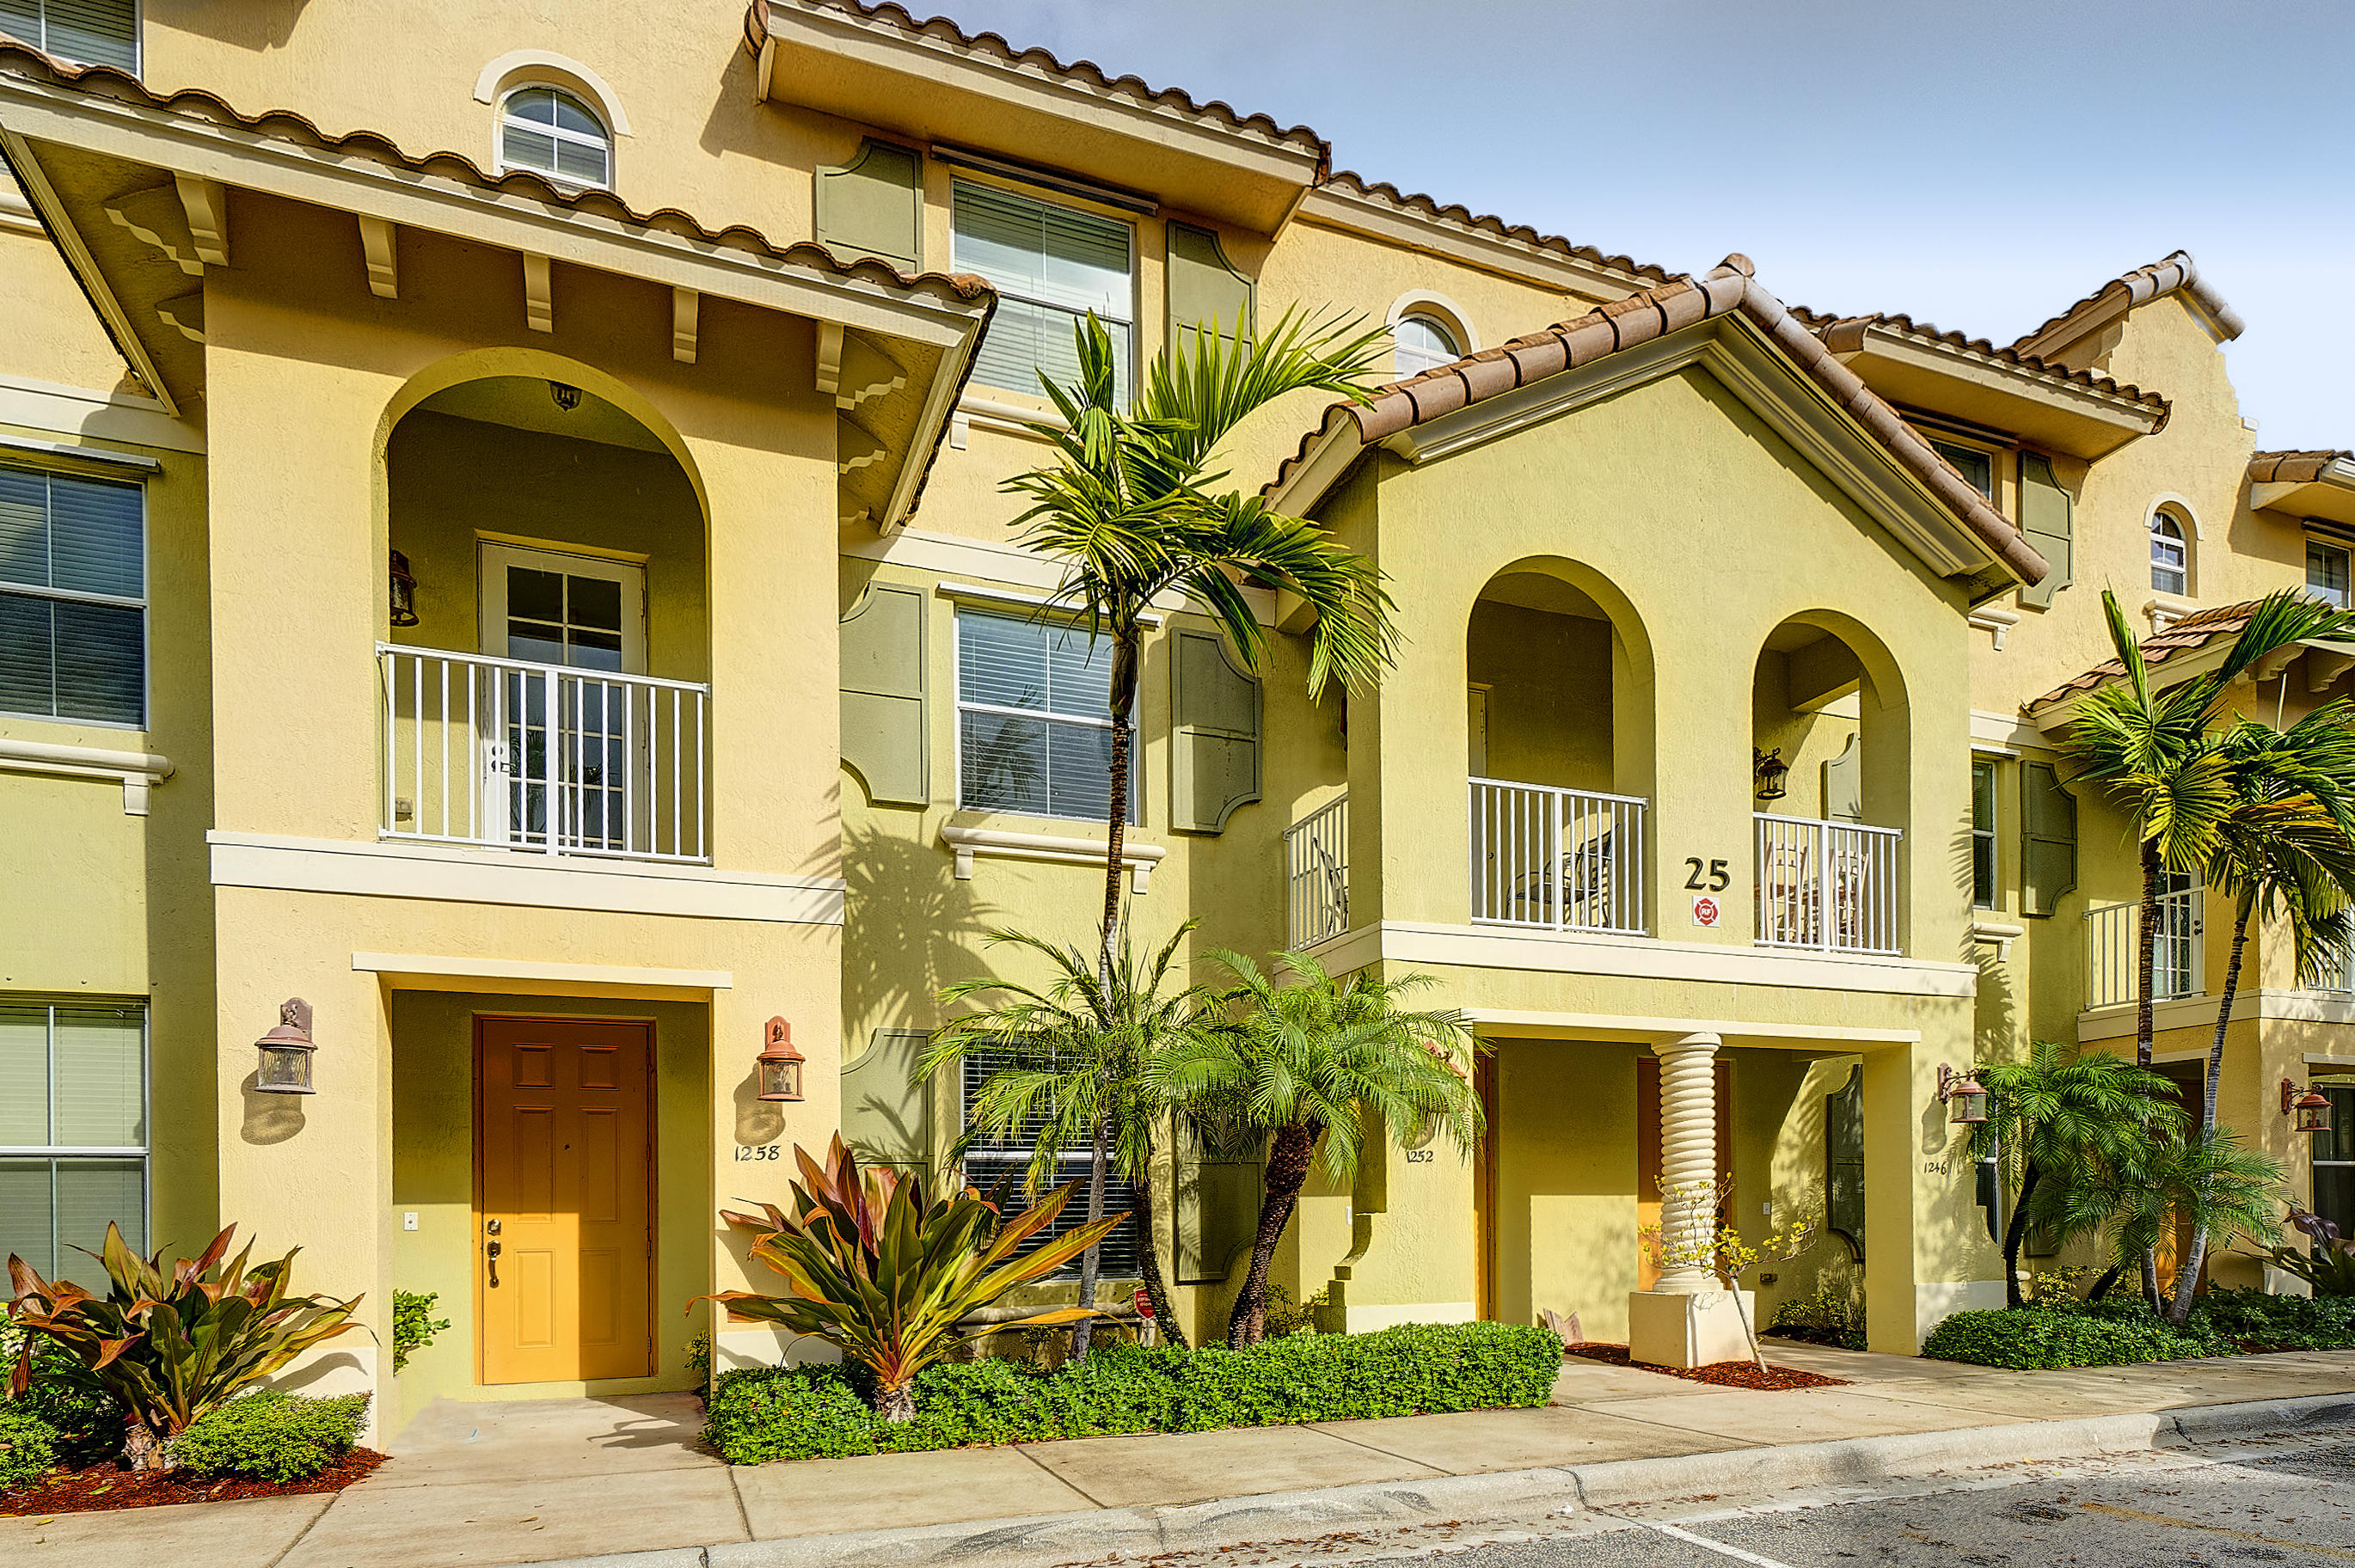 Home for sale in Renaissance Commons / Firenze Boynton Beach Florida